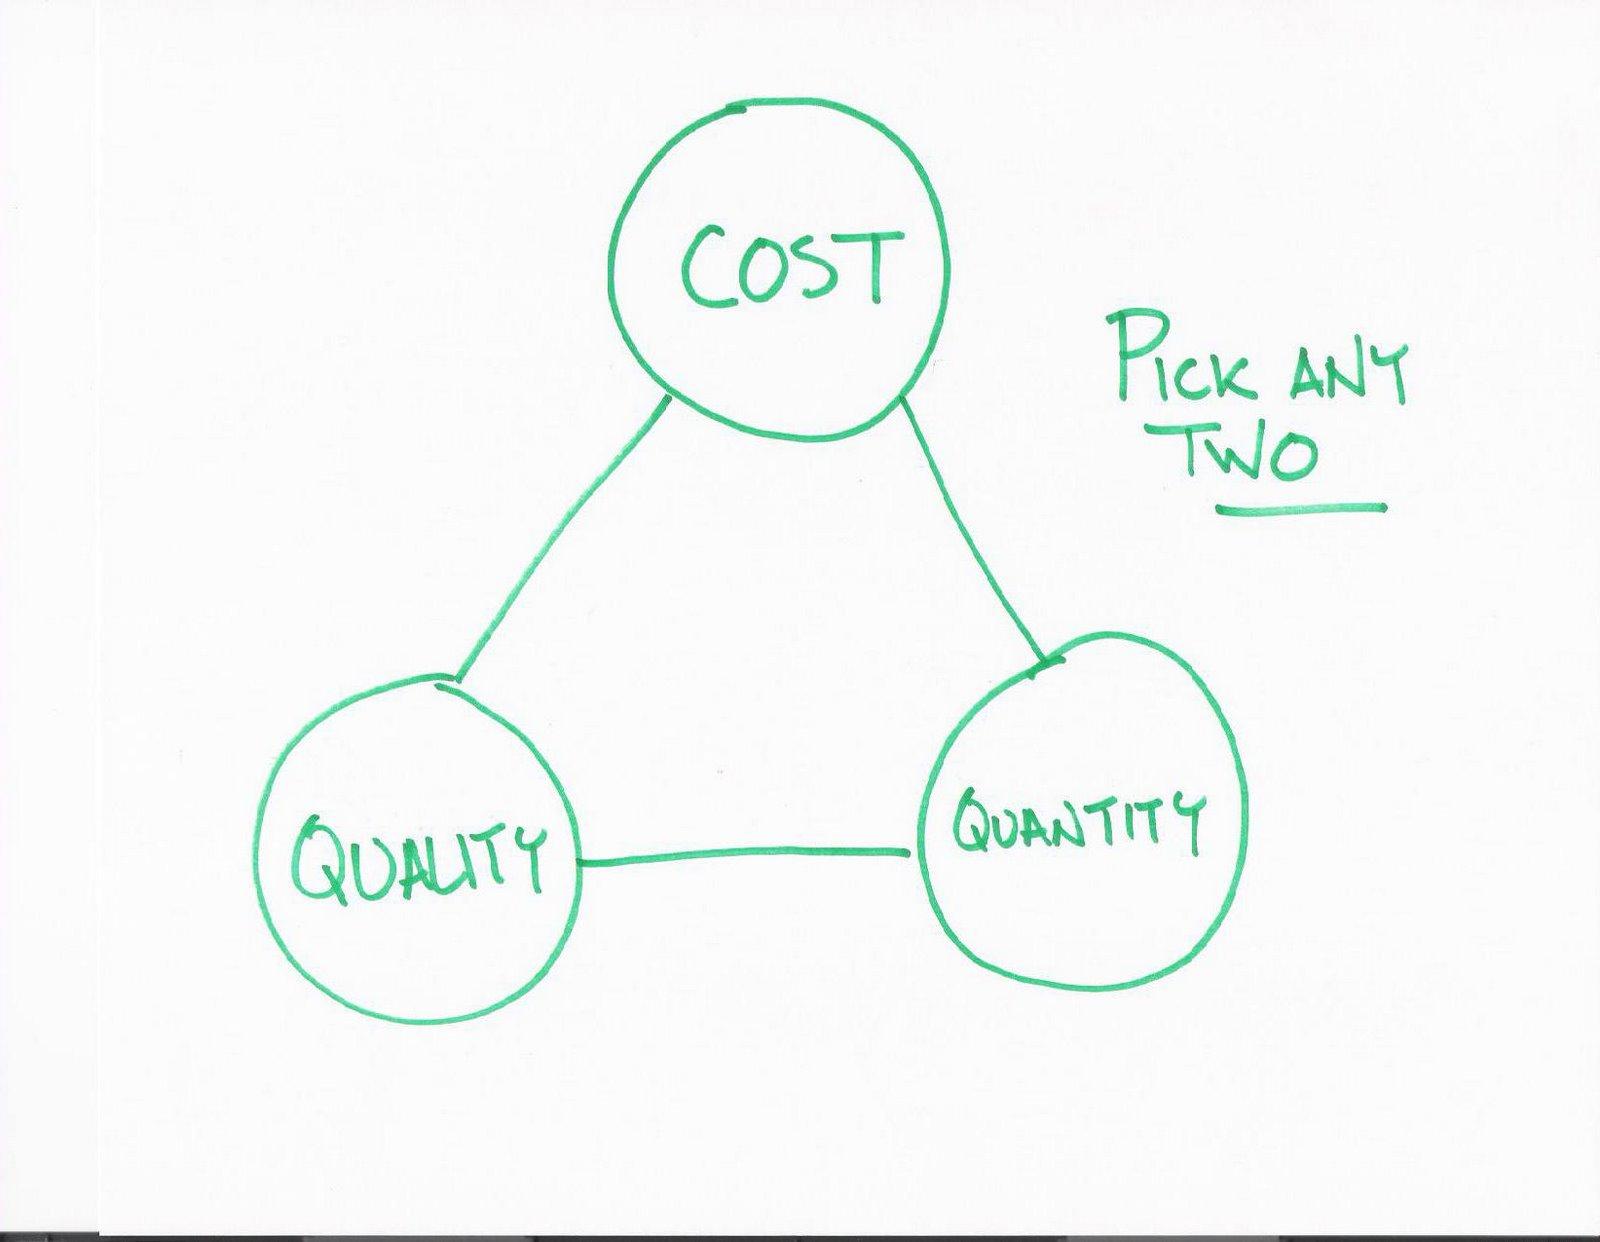 [Cost+Quality+Quantity]